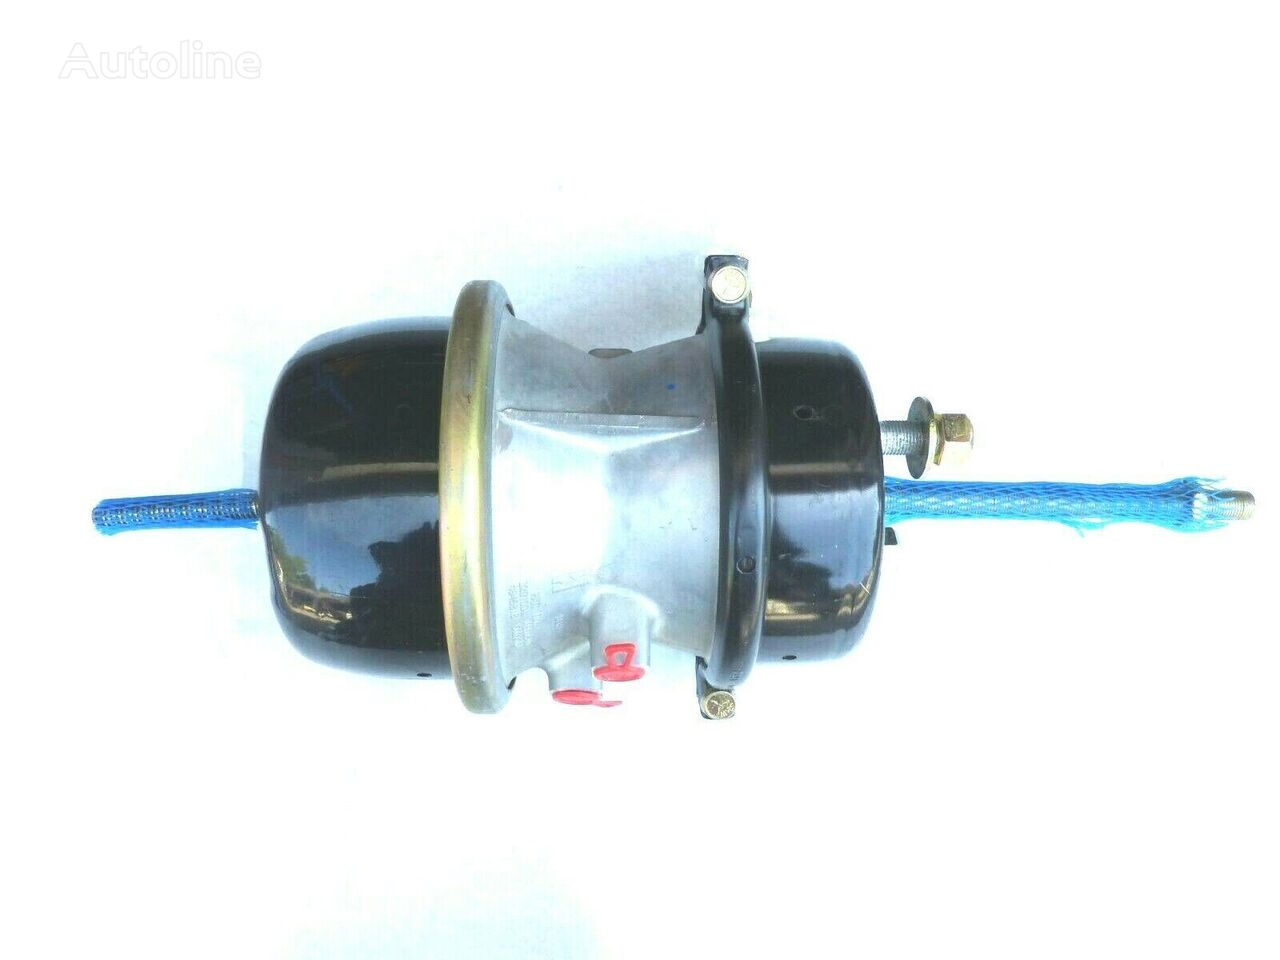 uudet kuorma-auto HALDEX Original Kombizylinder für Trommelbremse 4945818 (3291004) jarru akulla